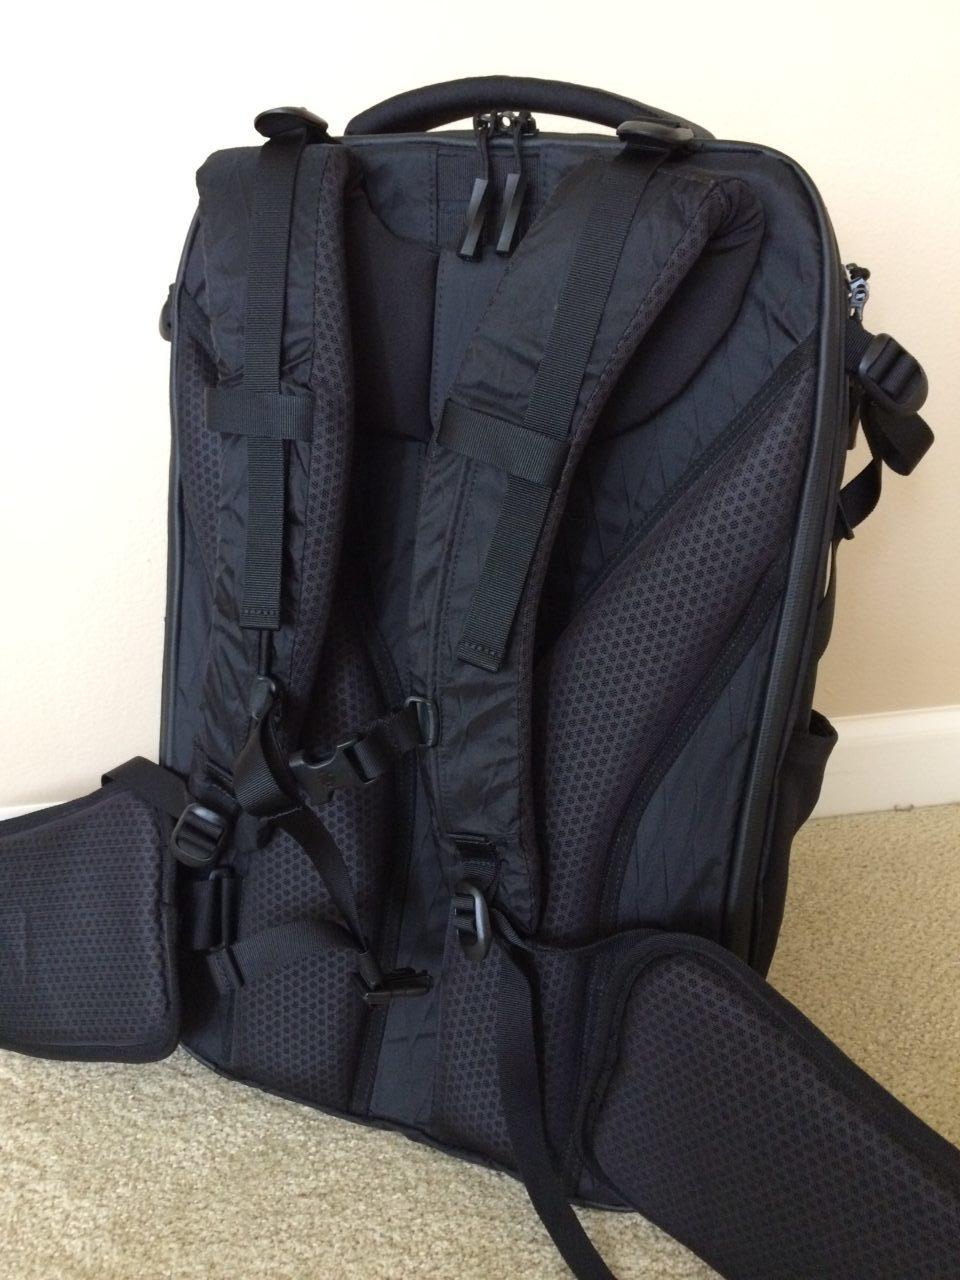 Tortuga Outbreaker Backpack back panel